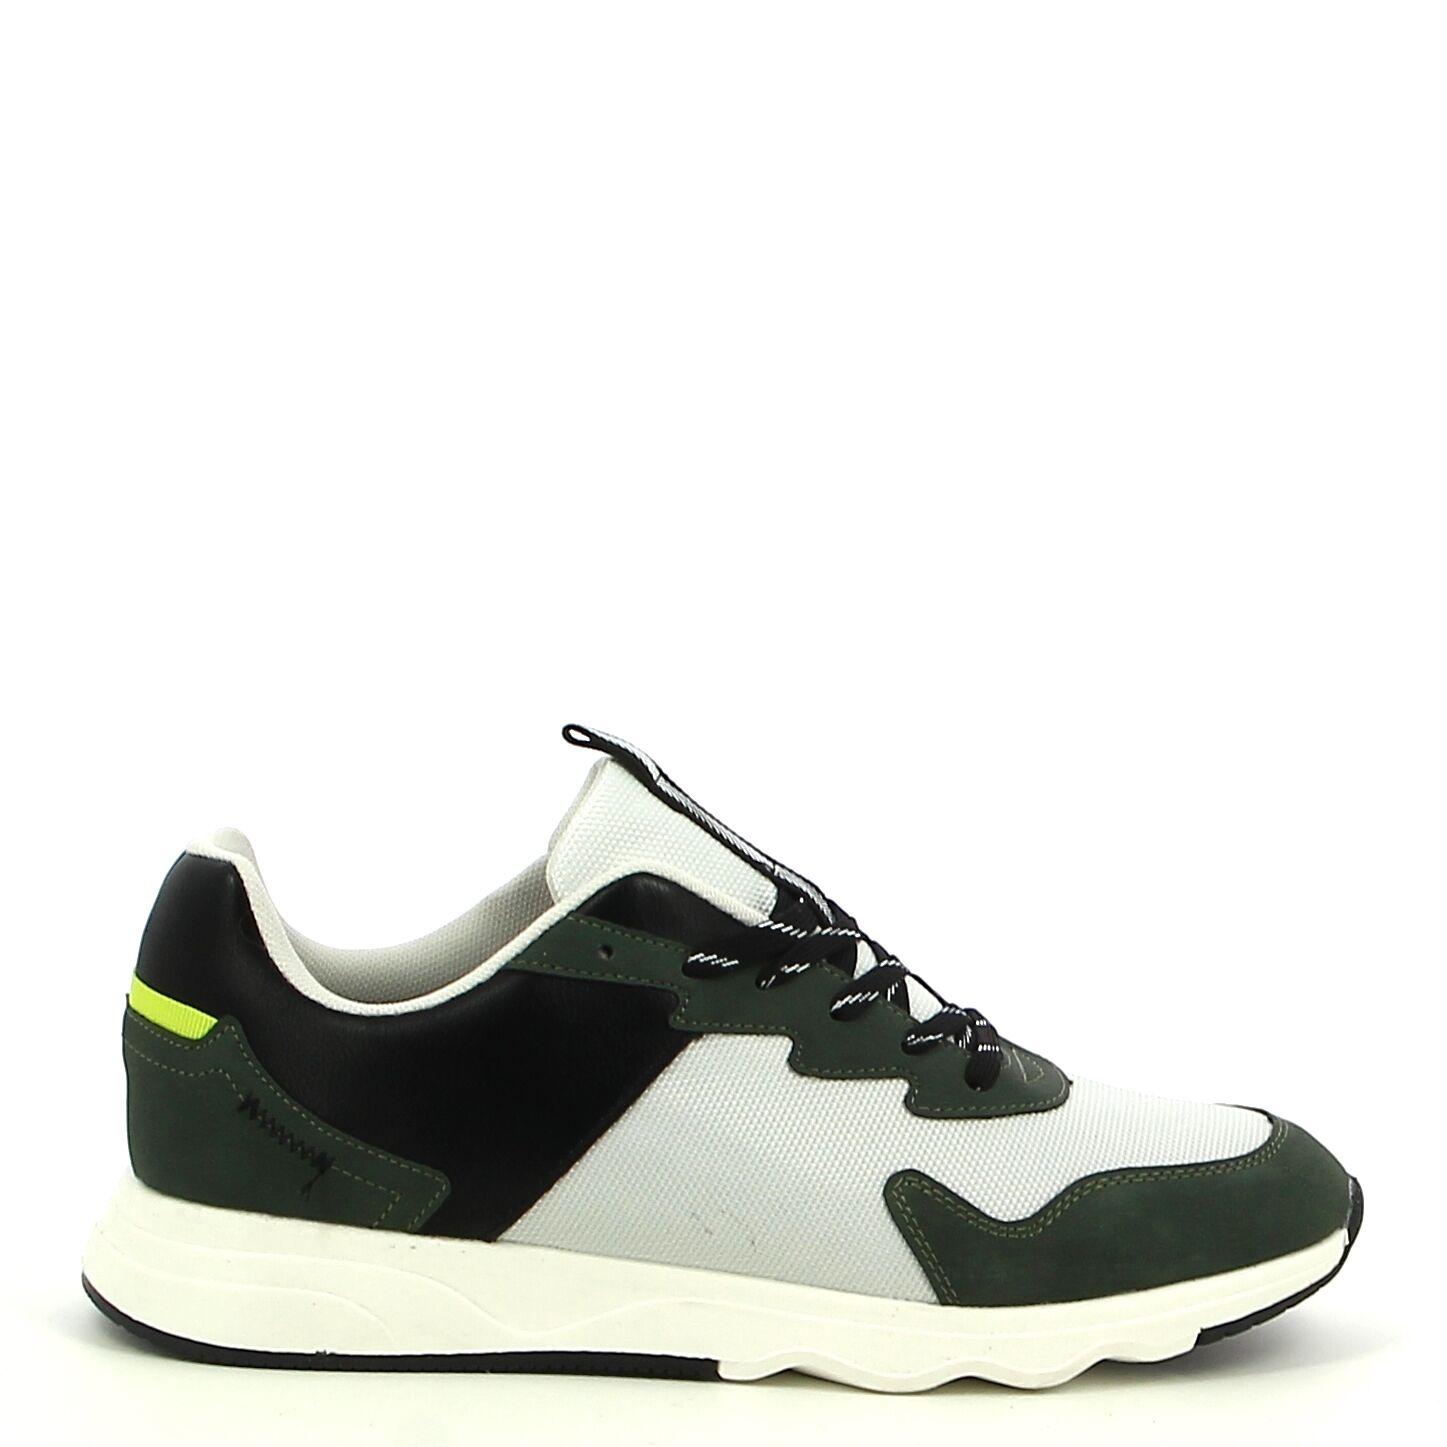 Ken Shoe Fashion - Kaki/Wit - Sneakers